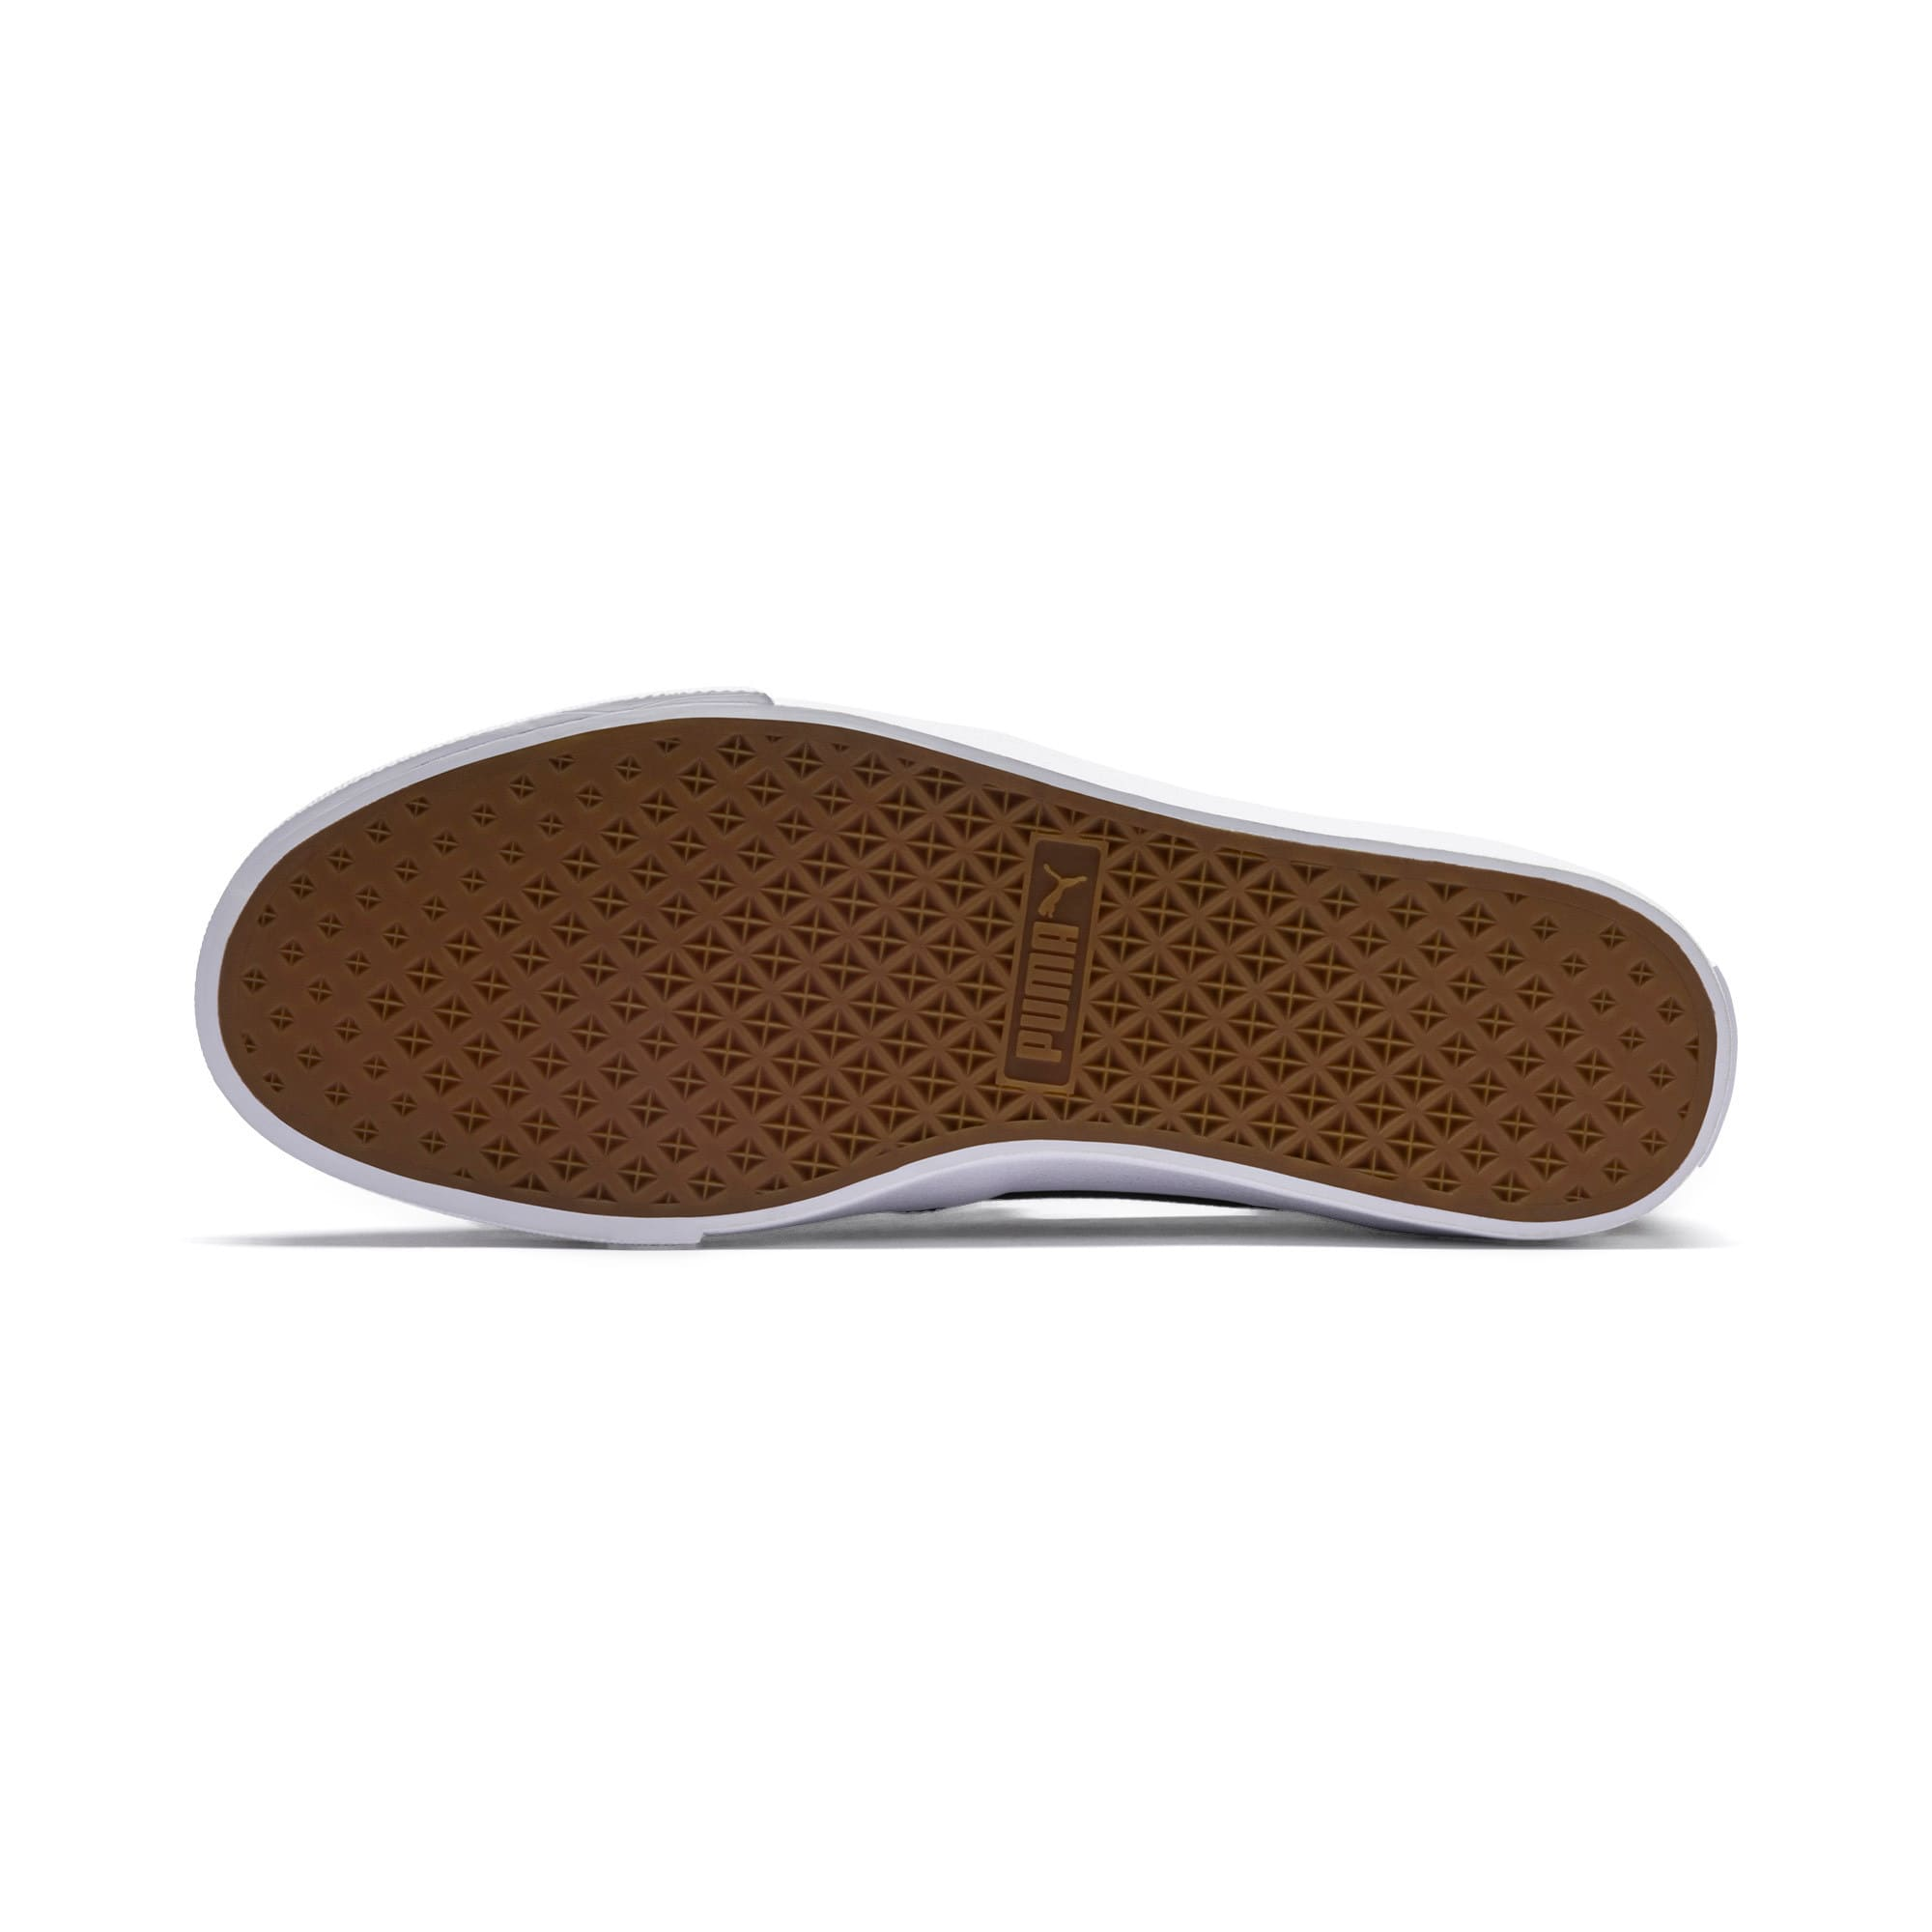 Thumbnail 3 of Bari Slip-On Shoes, Puma Black-Puma White, medium